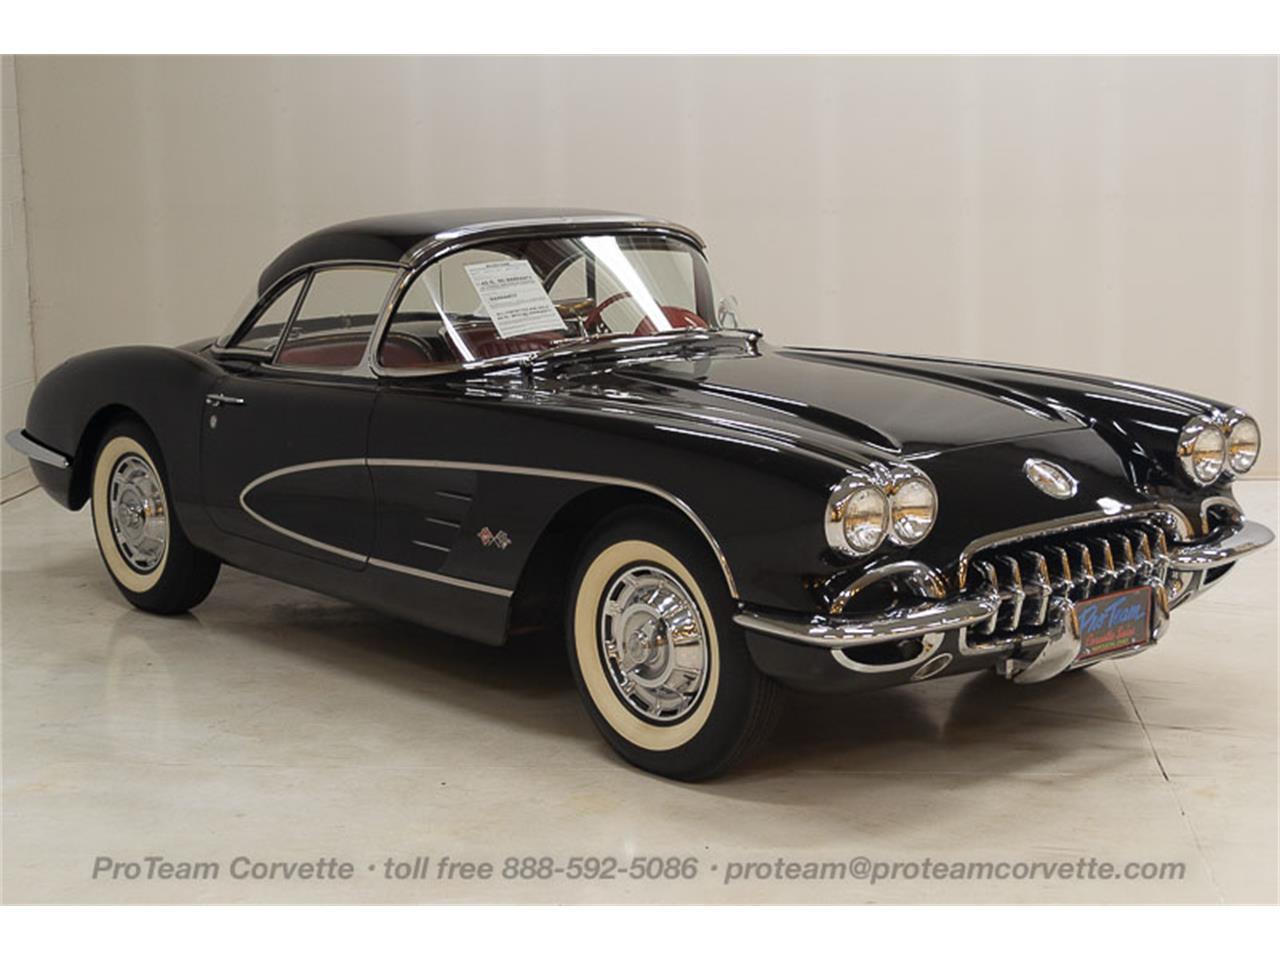 Used Food Trucks For Sale Under 5000 >> 1960 Chevrolet Corvette for Sale   ClassicCars.com   CC ...